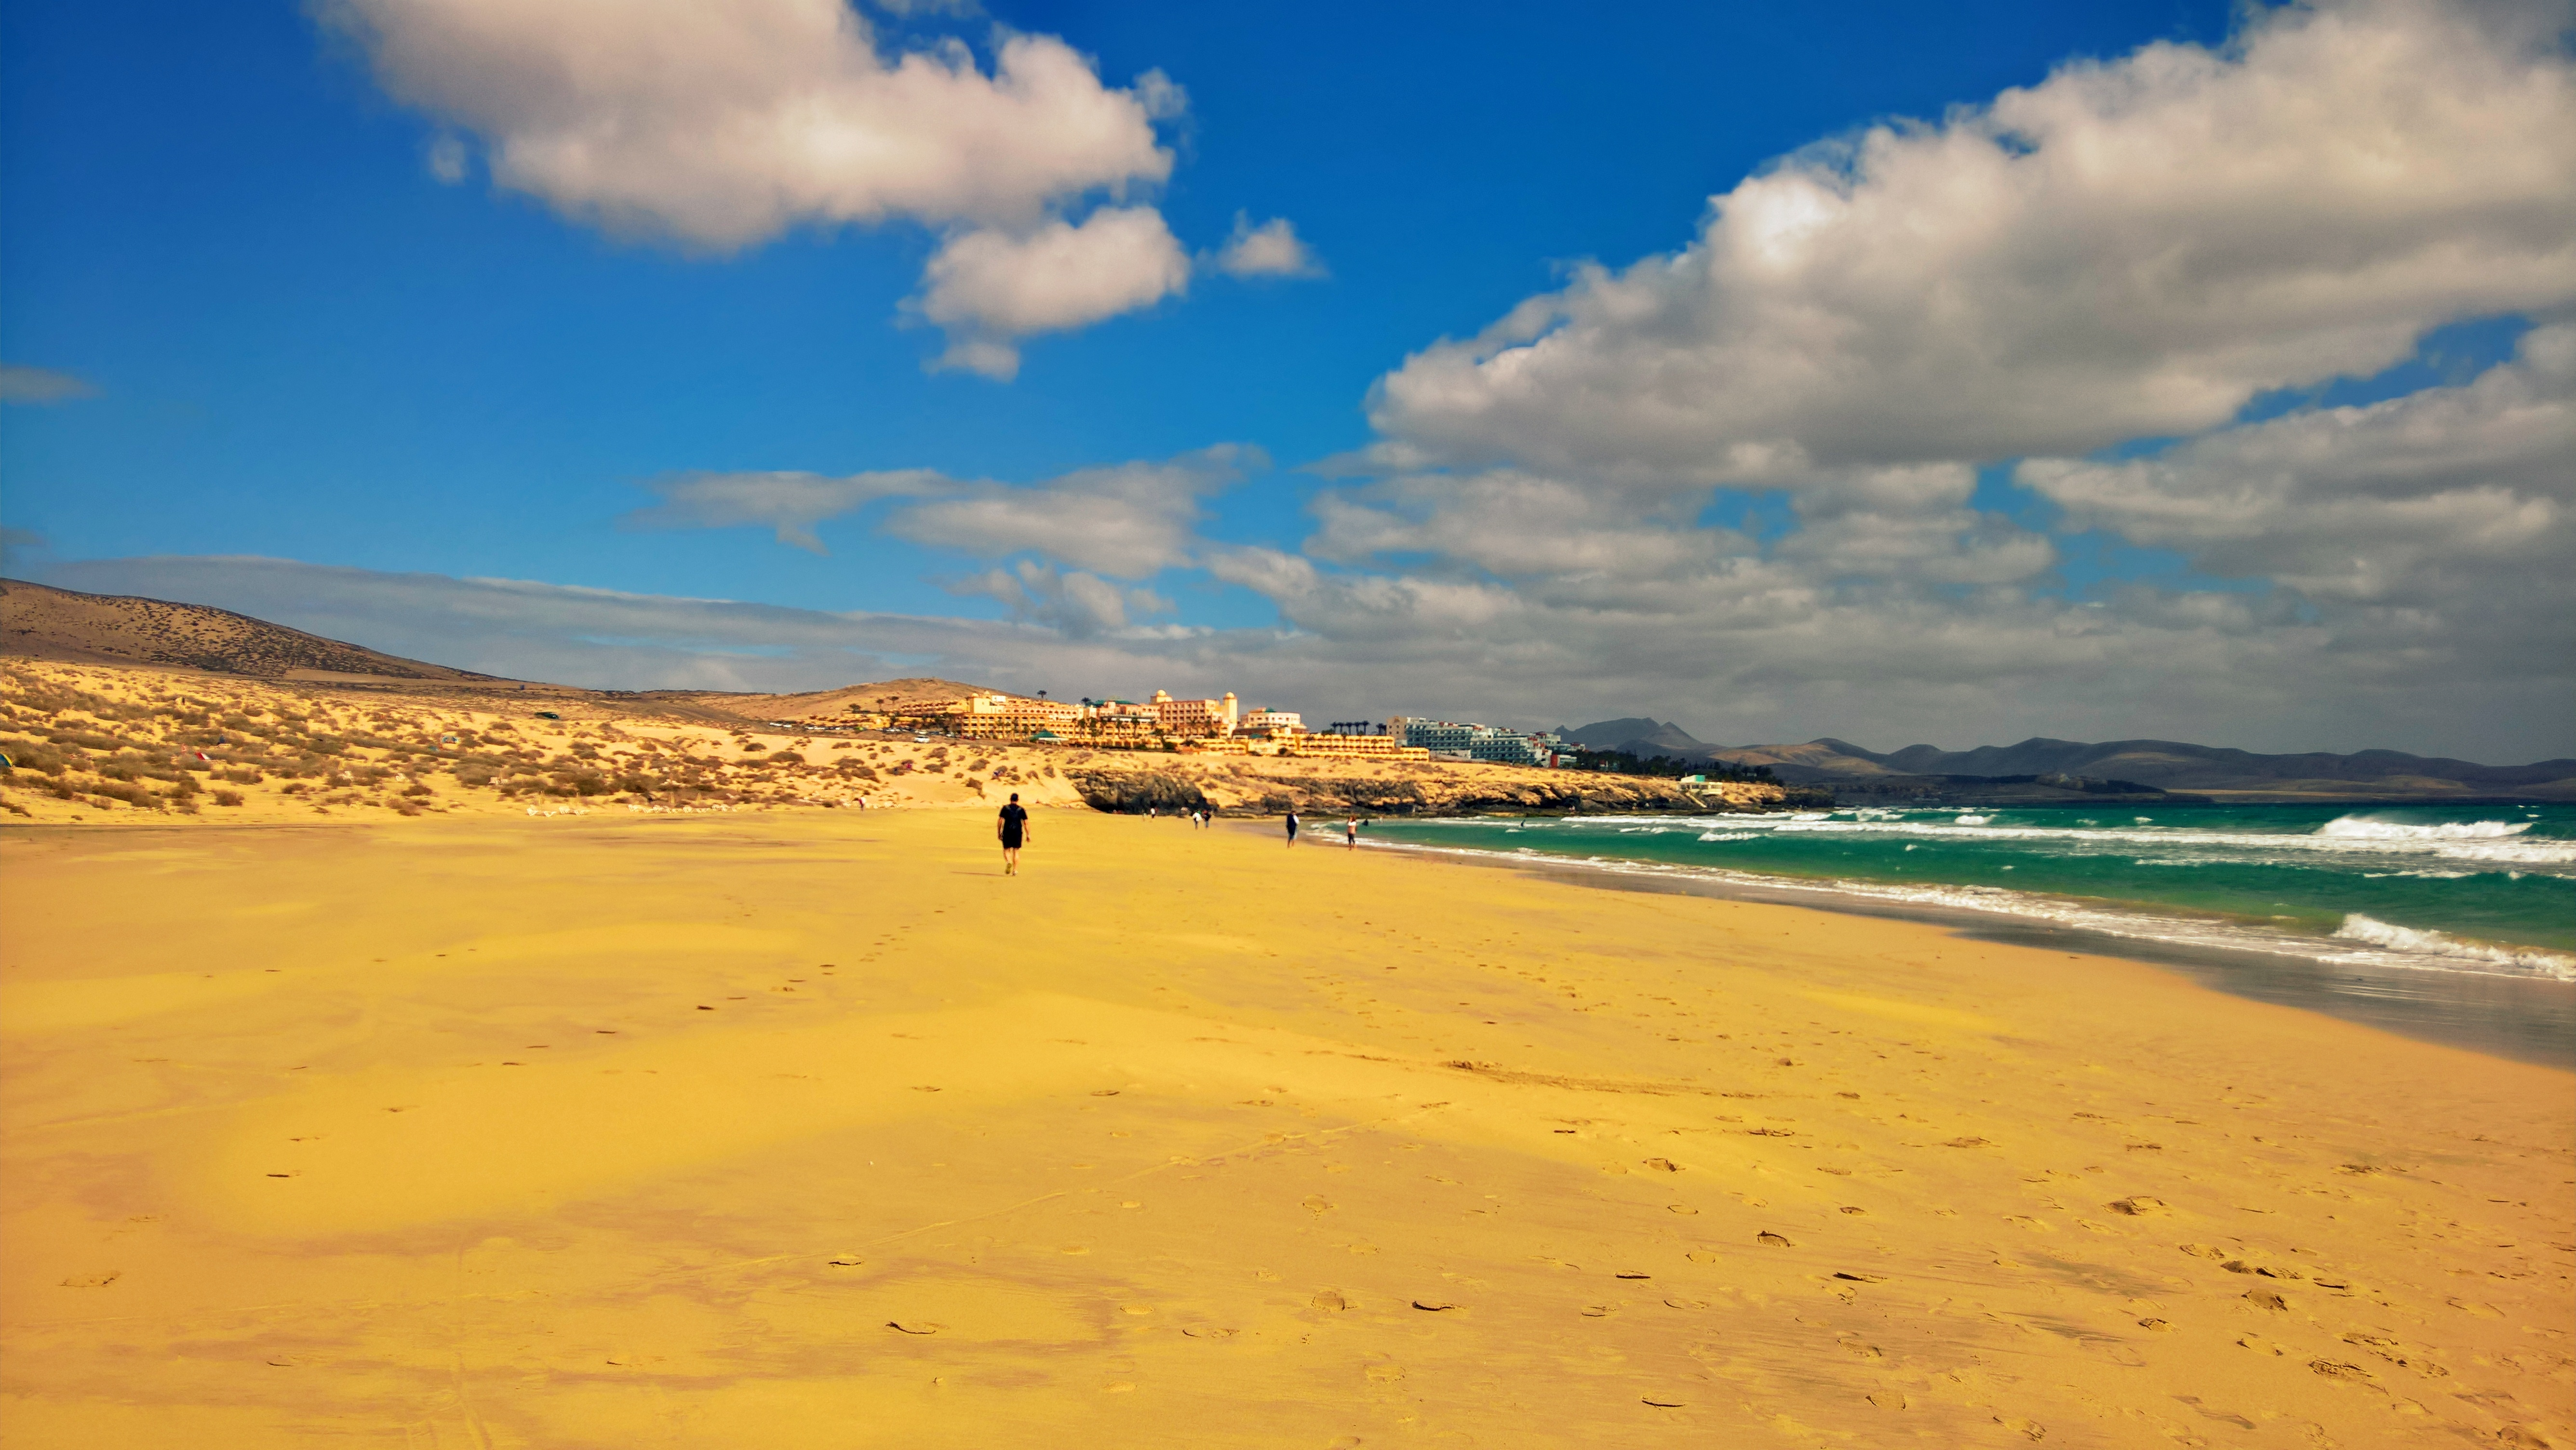 Fuerteventura: Playa Esmeralda